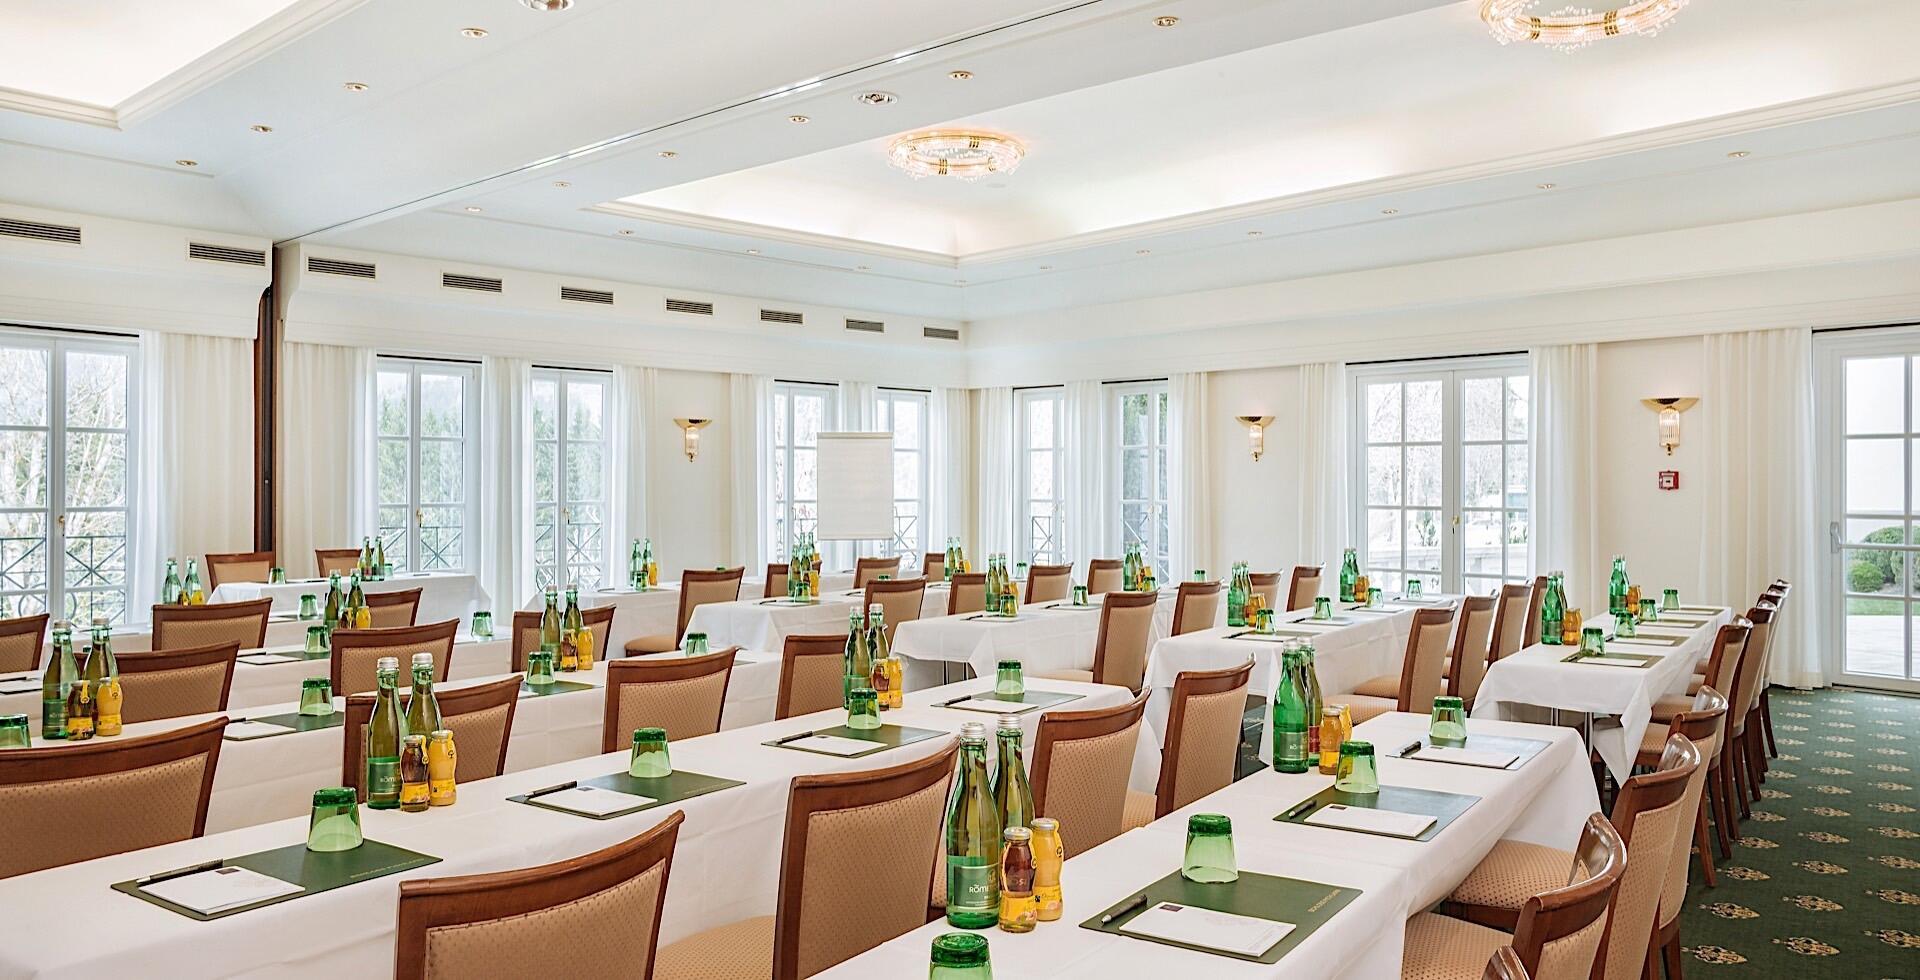 Conferences at Romantik Hotel Schloss Pichlarn, Austria